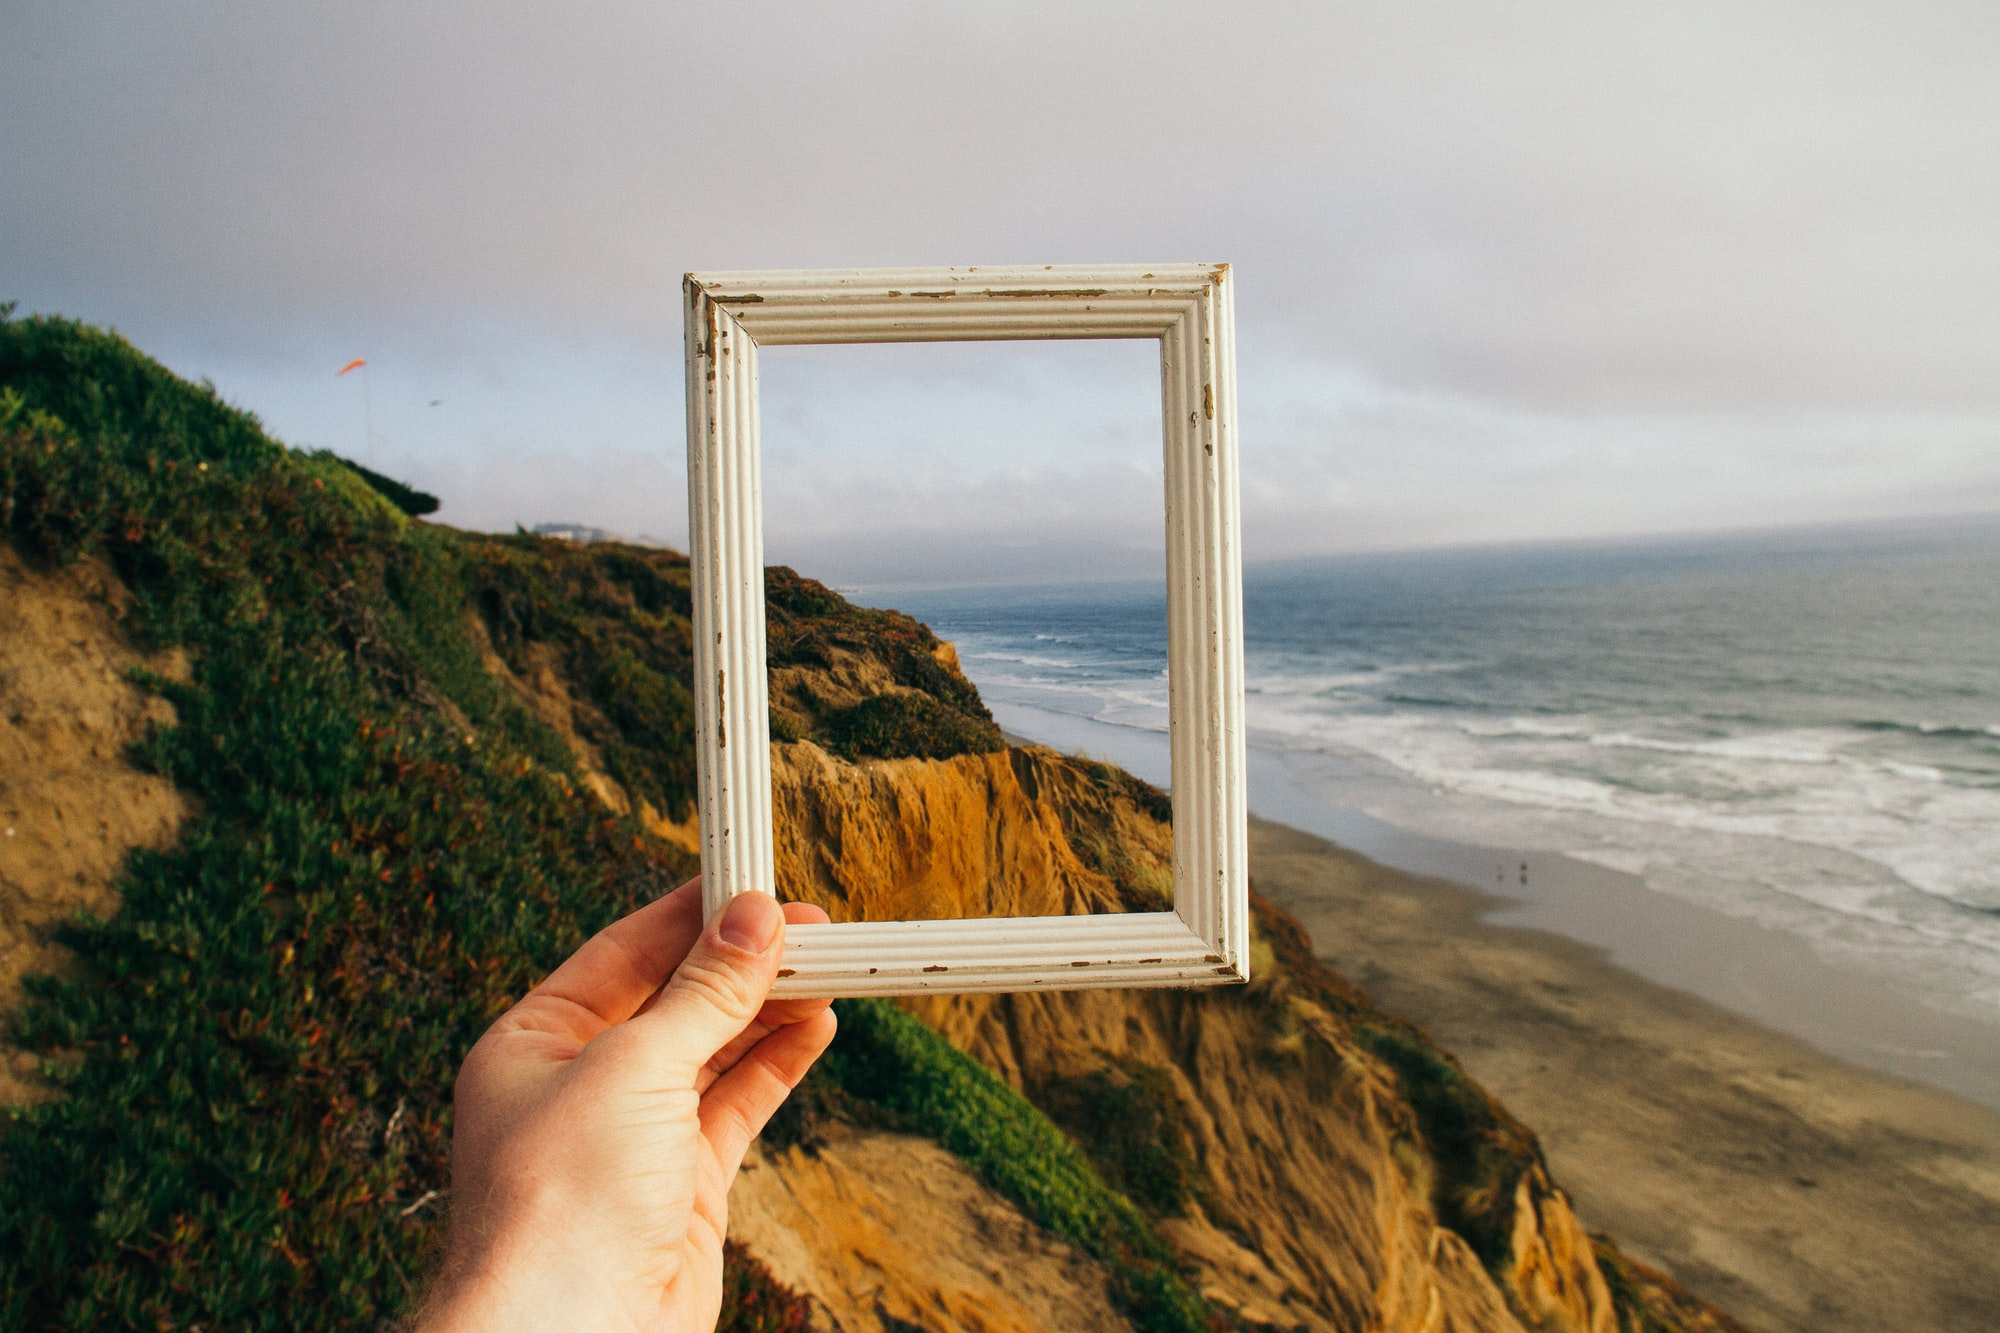 Gratitude Stories: Cultivating a Habit of Gratitude